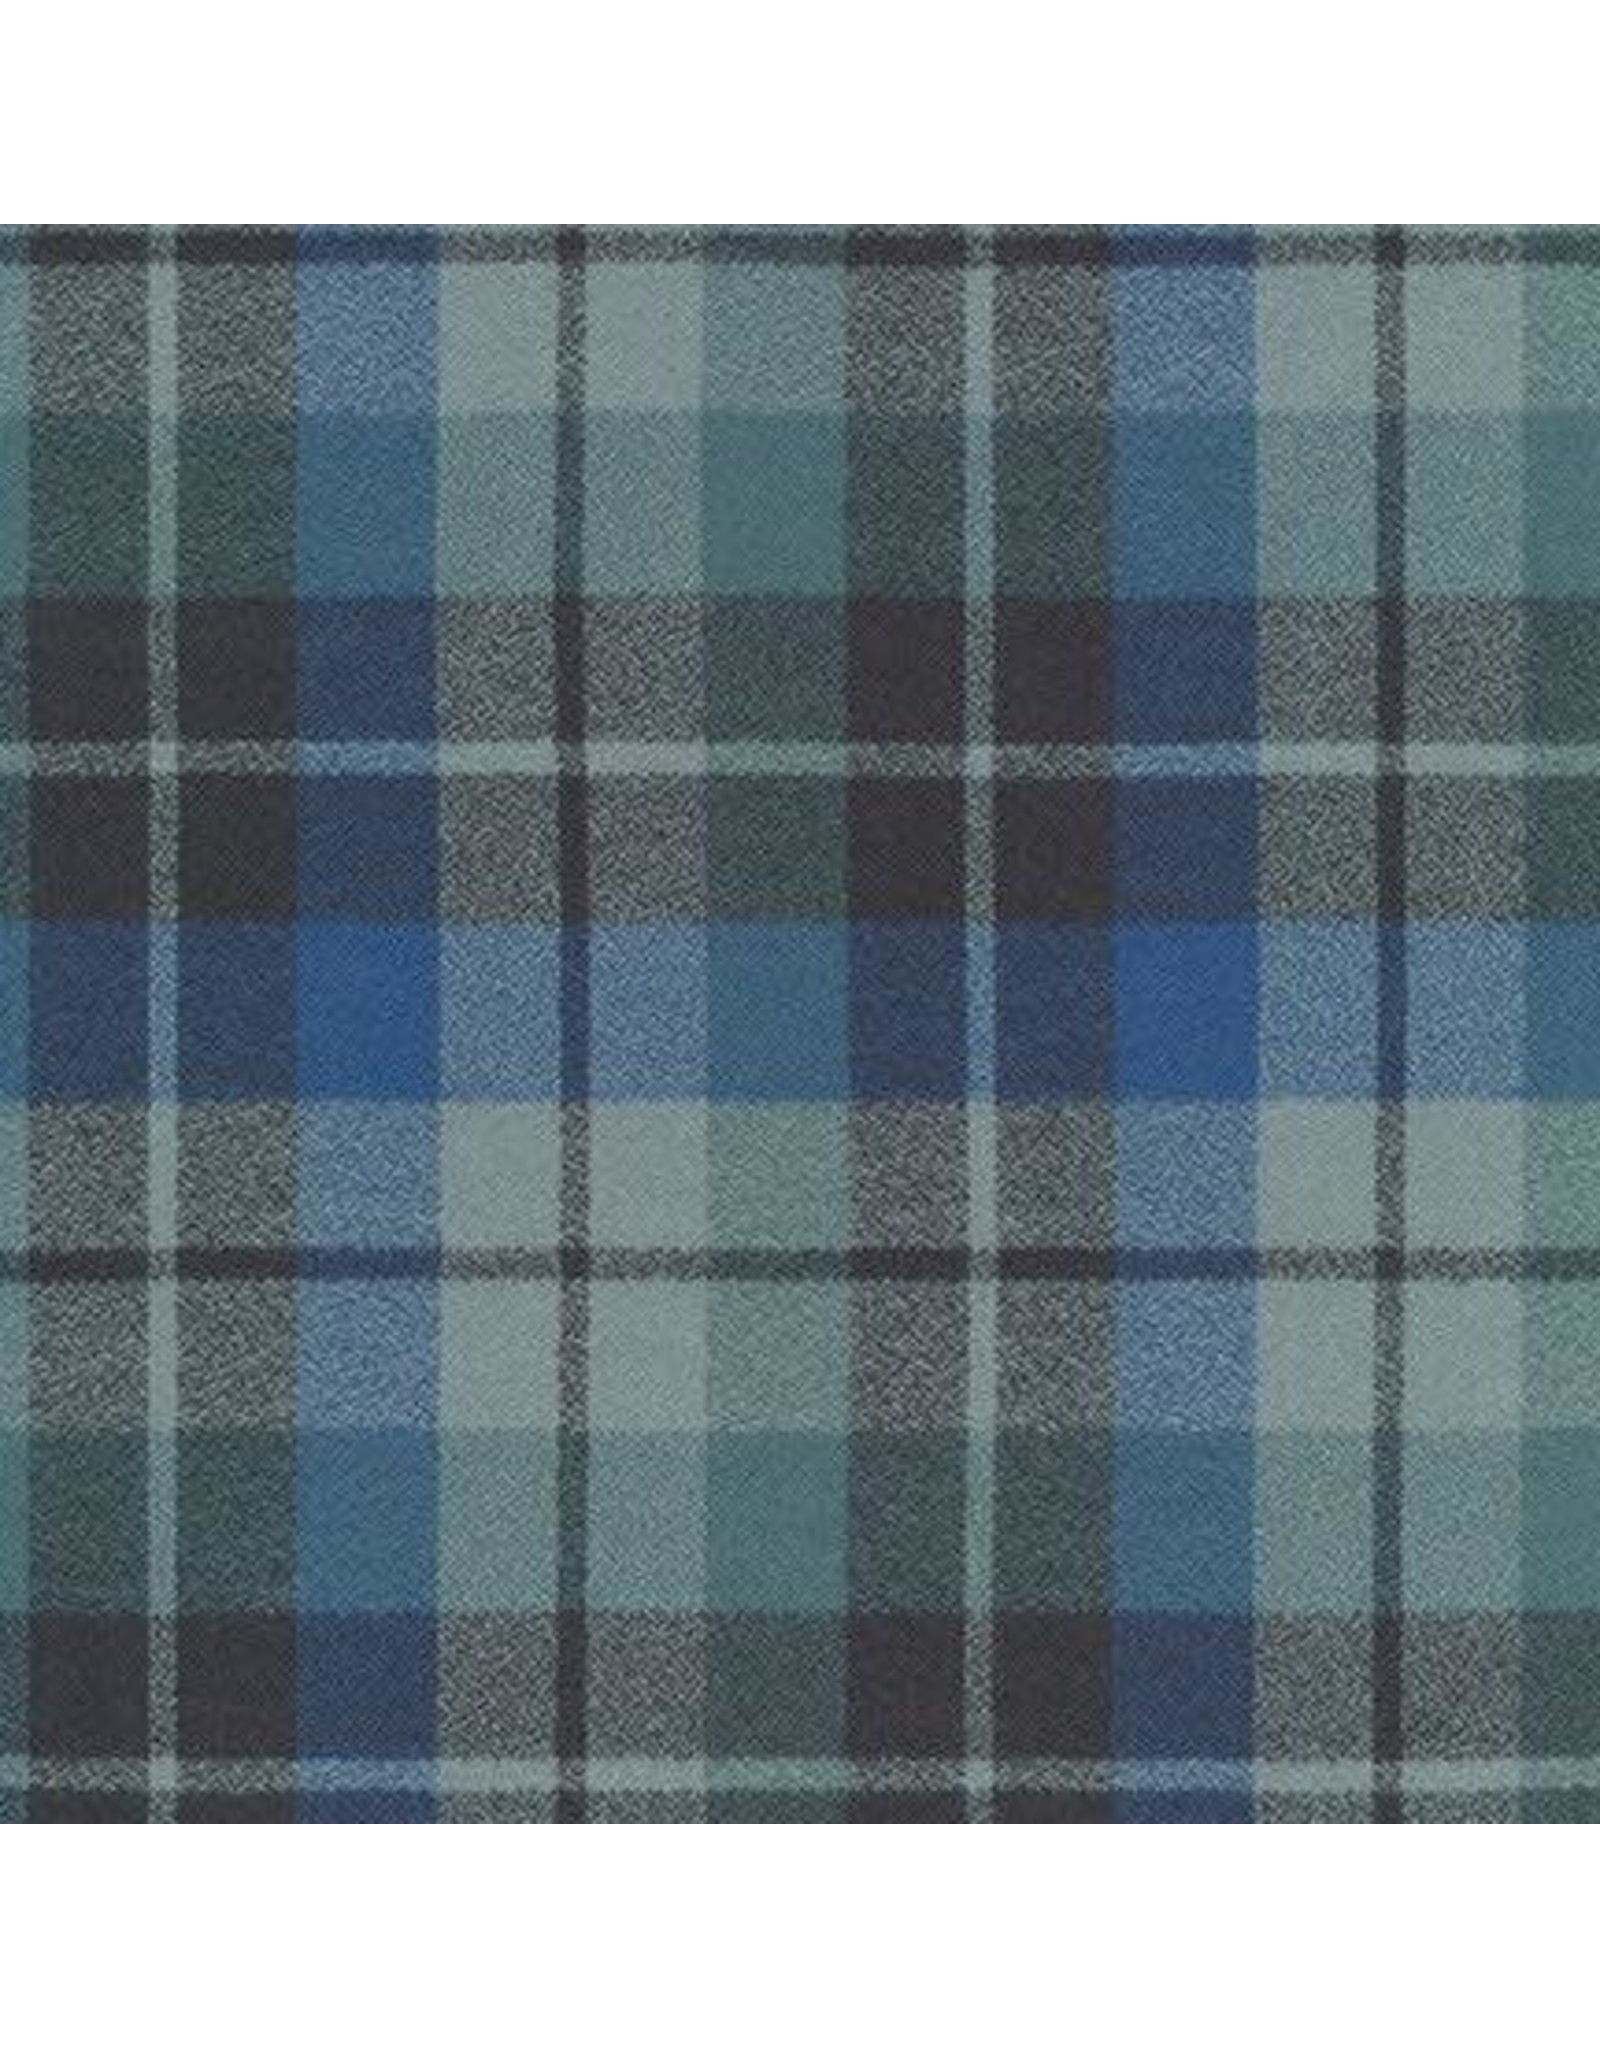 Robert Kaufman Yarn Dyed Cotton Flannel, Mammoth Flannel in Shadow, Fabric Half-Yards SRKF-19667-304